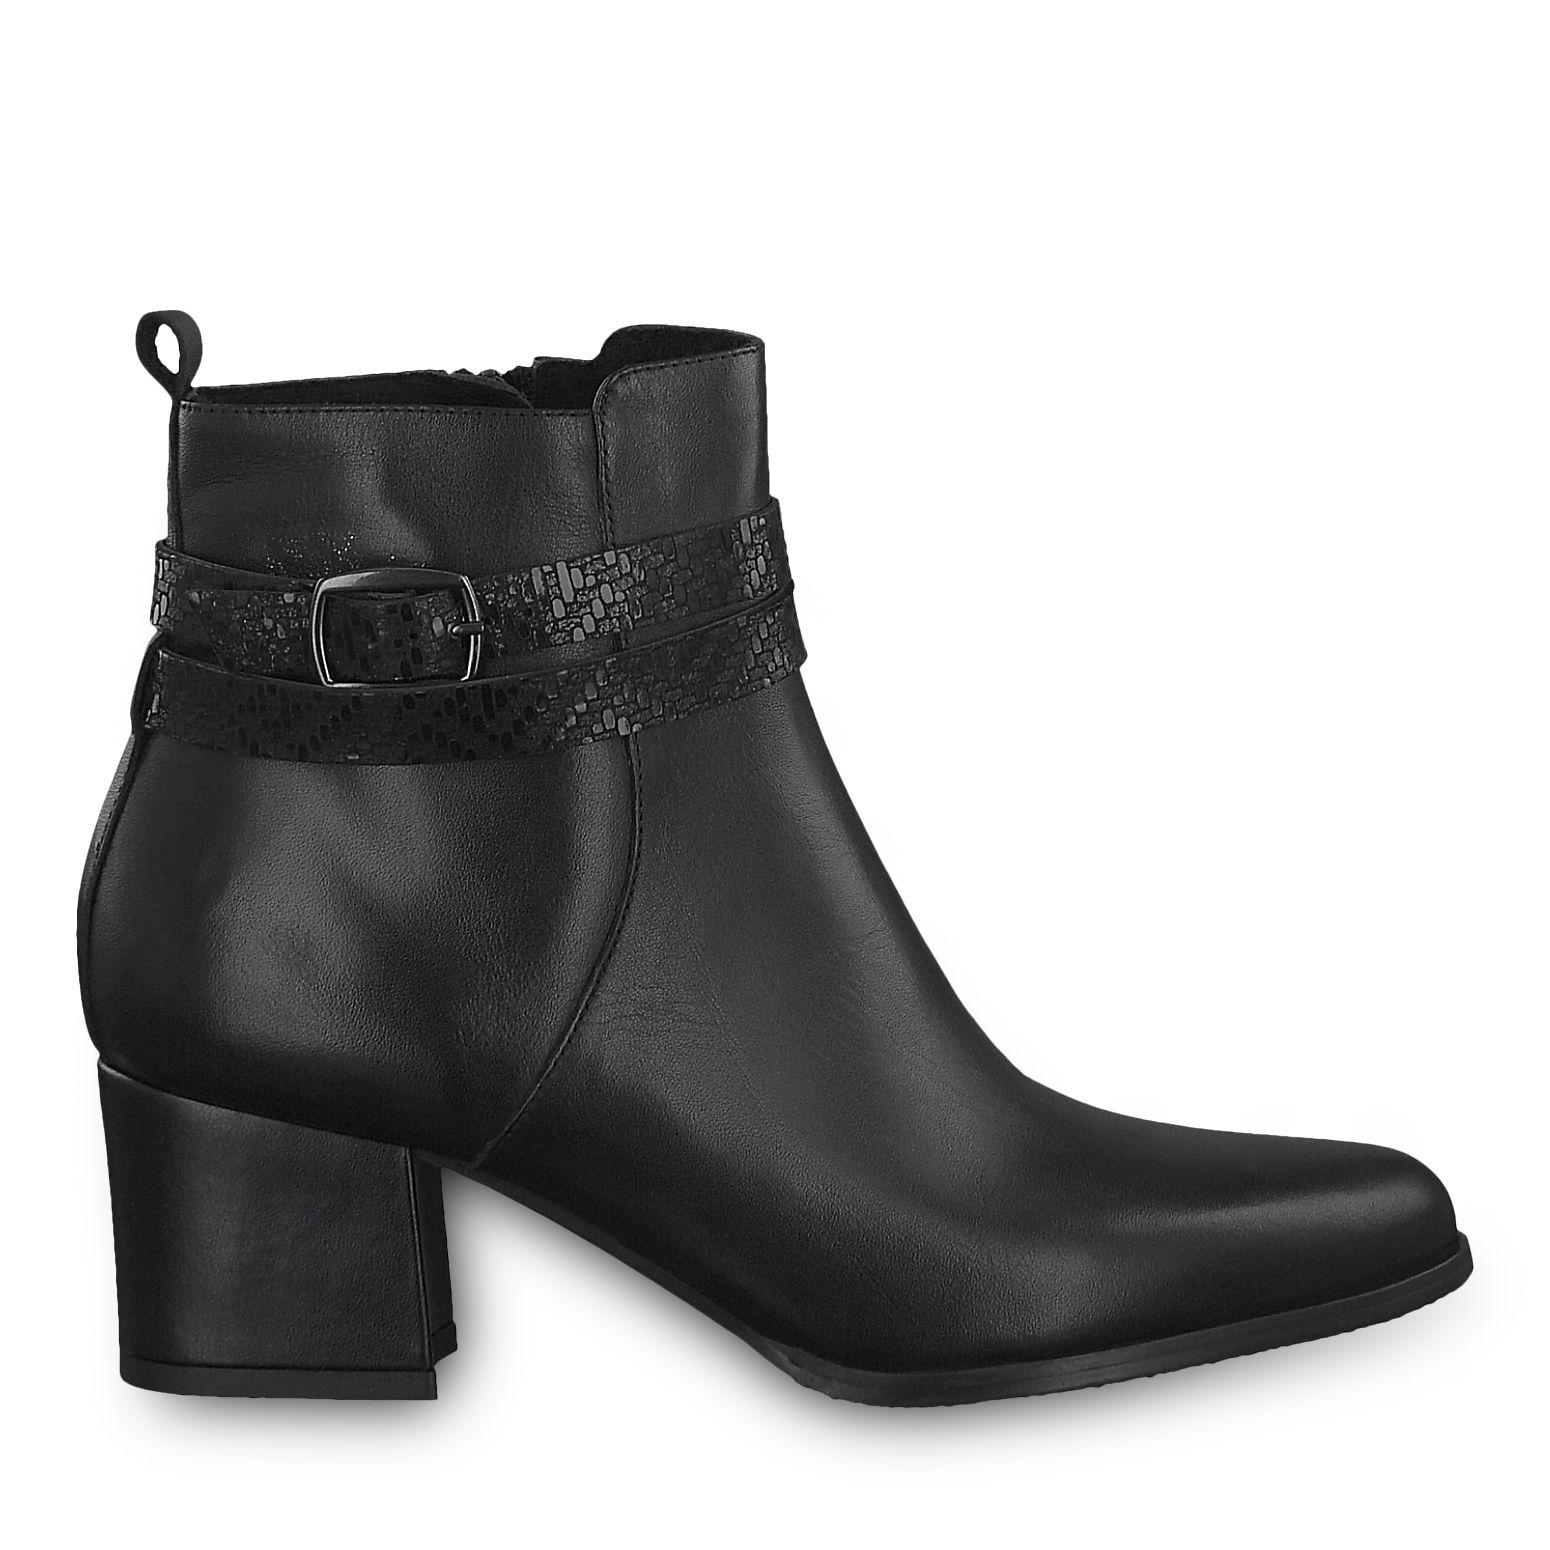 85572364a0d Rebekka 1-1-25057-29: Buy Tamaris Booties online!   Favo   Booty ...